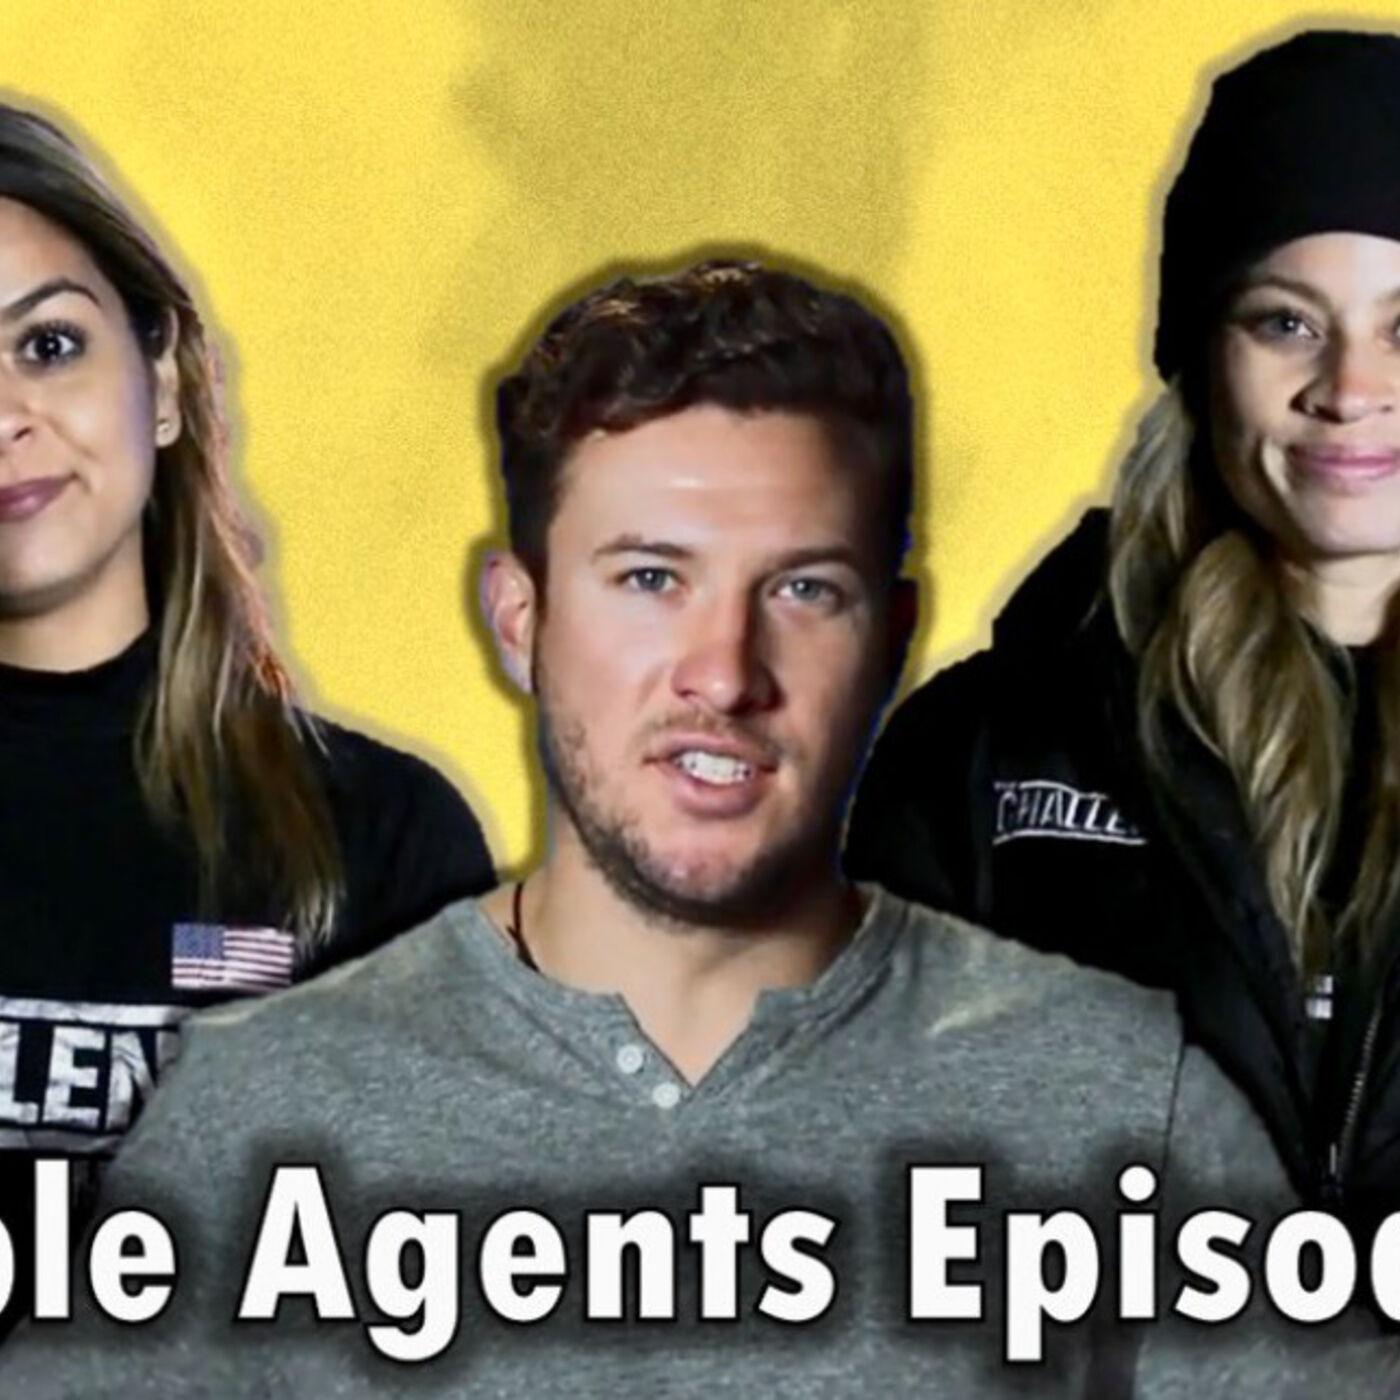 Challenge Double Agents Episode 10 Recap: Small Brawl